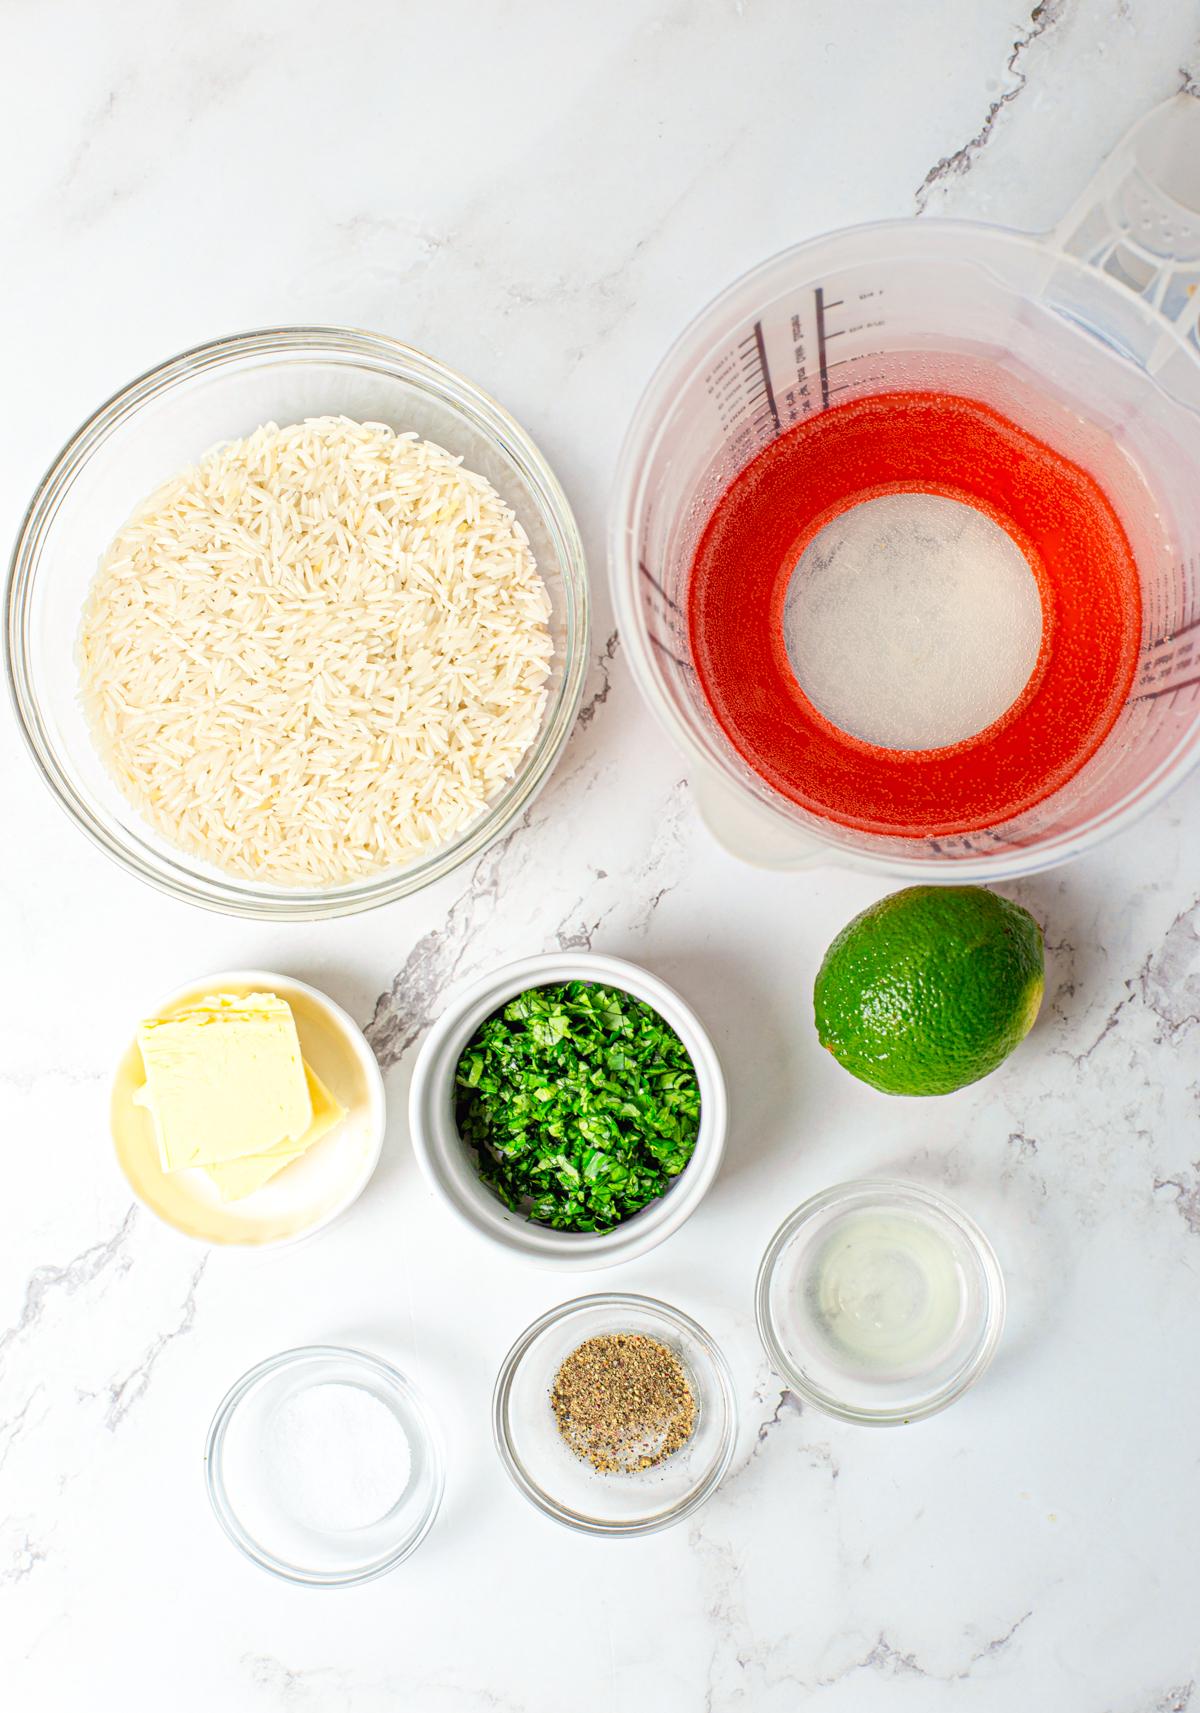 Ingredients need to make Cilantro Lime Rice